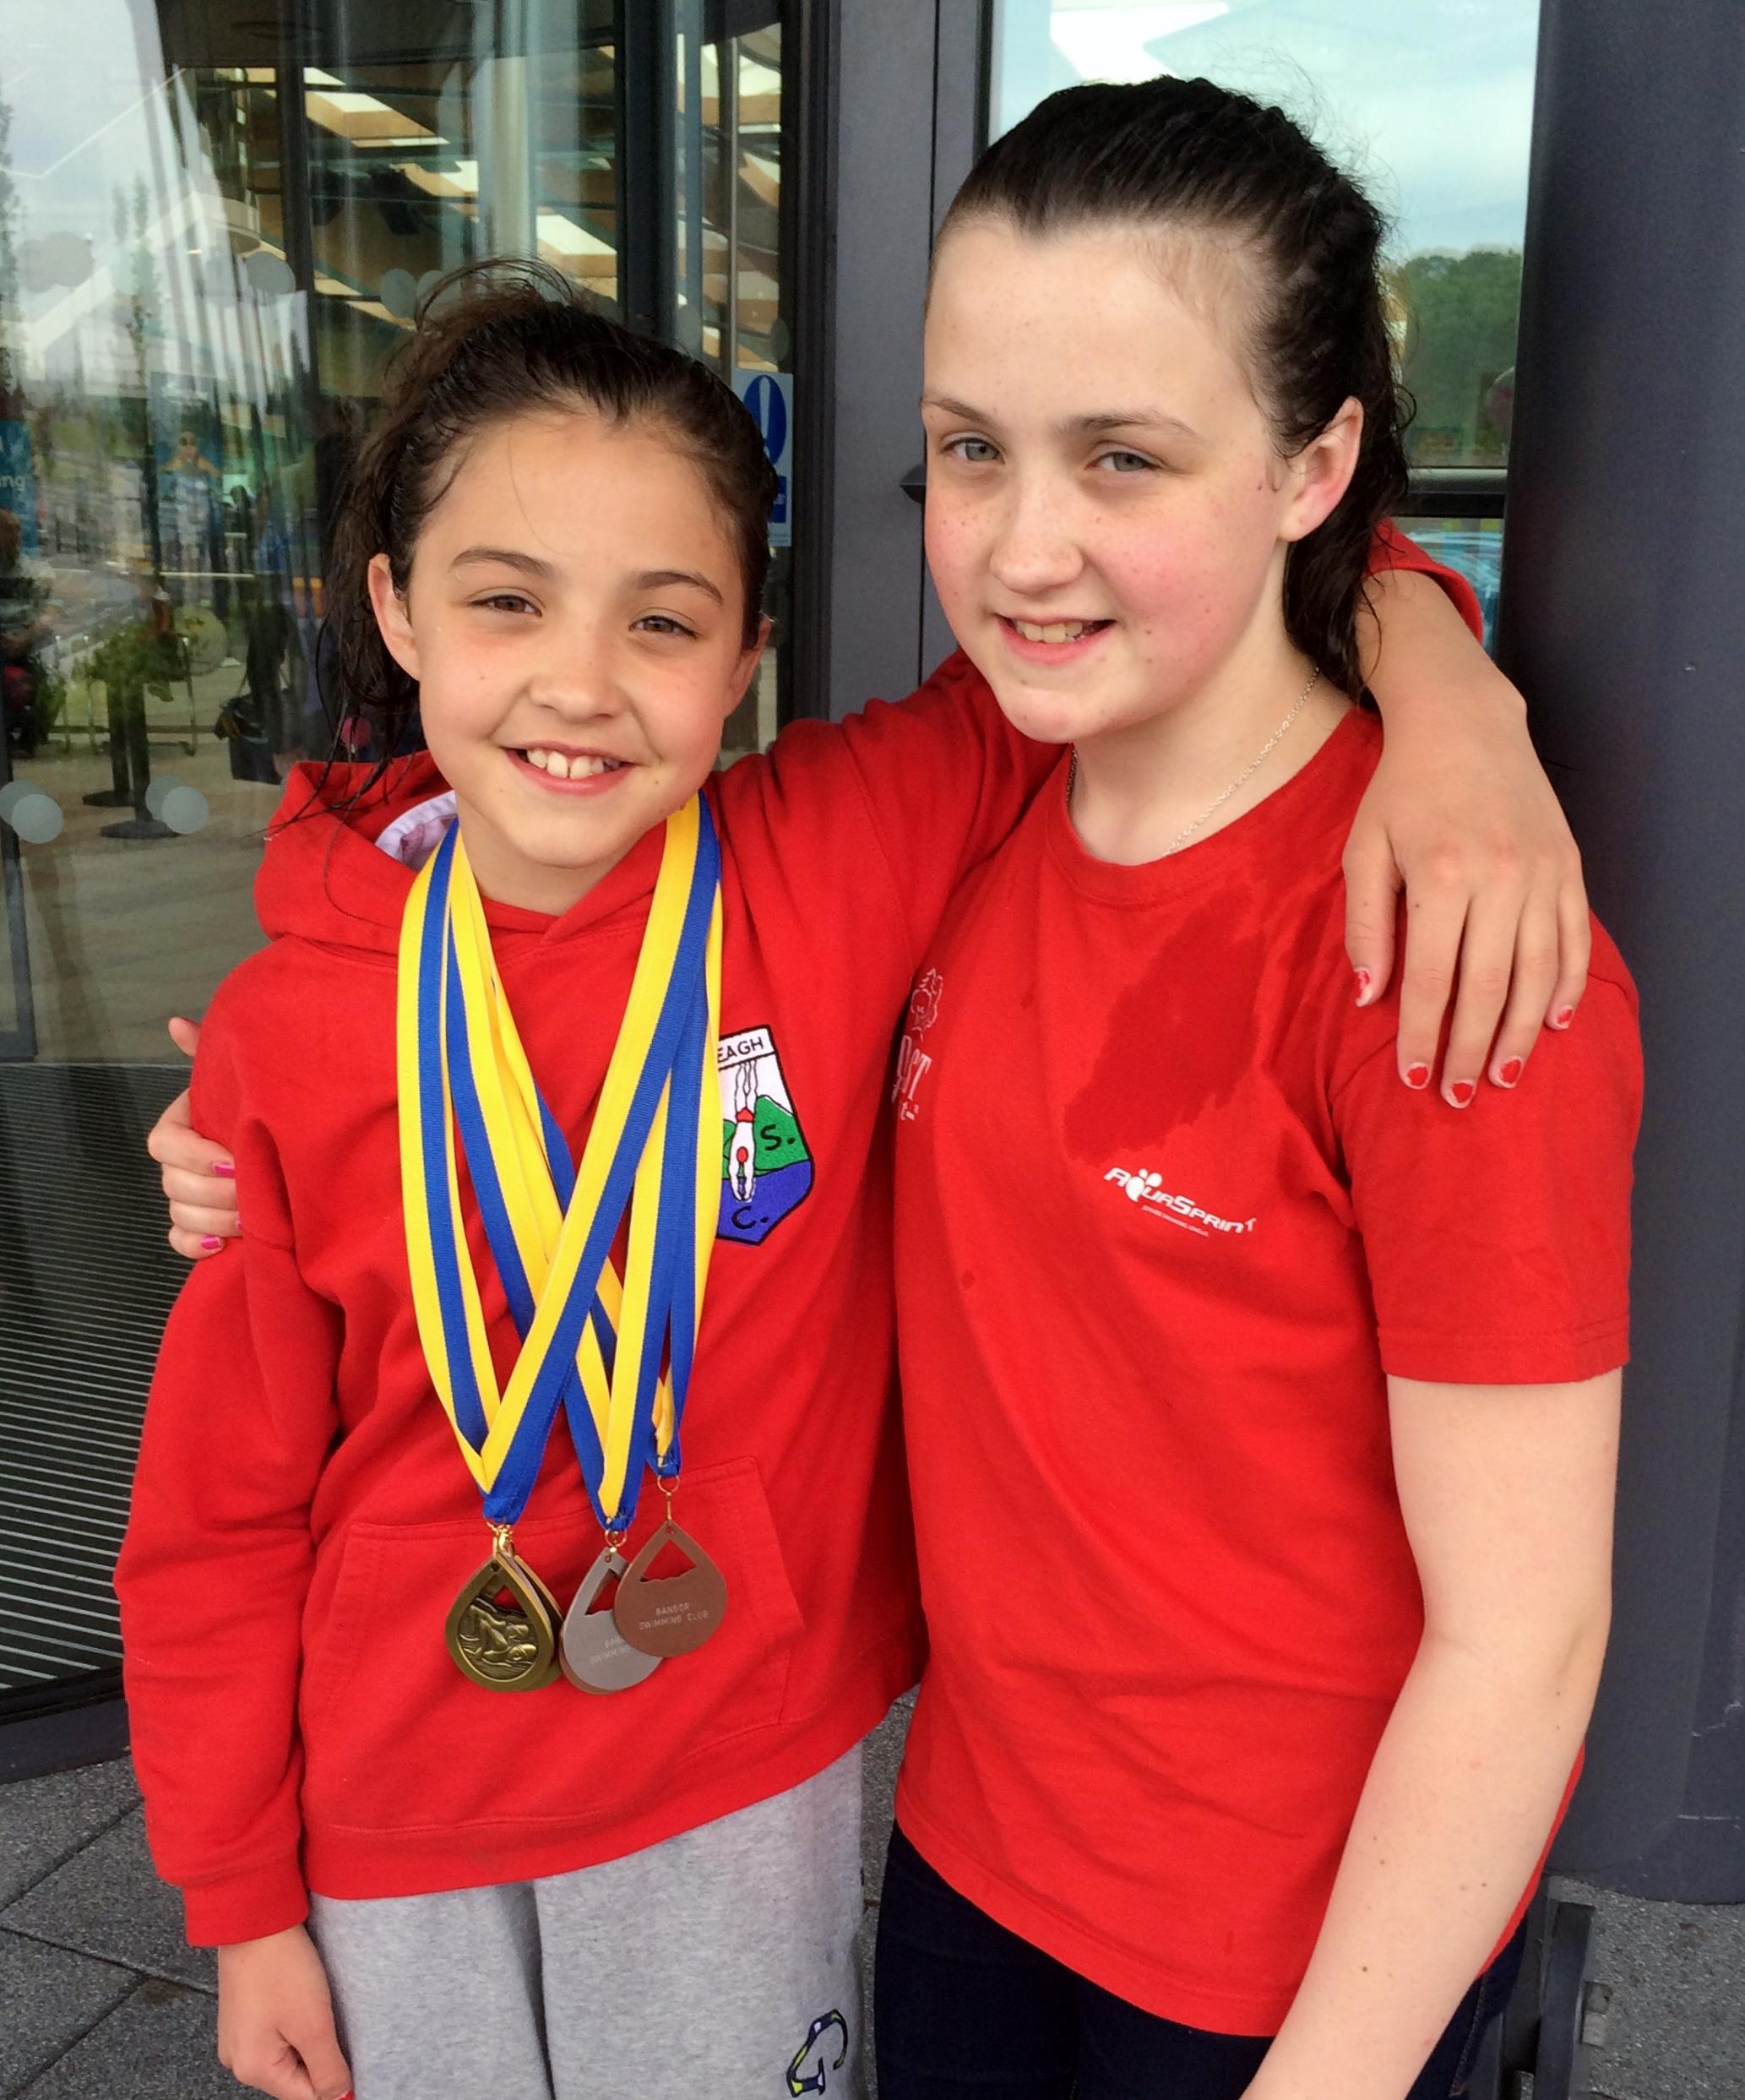 Sisters at Bangor long Course Meet